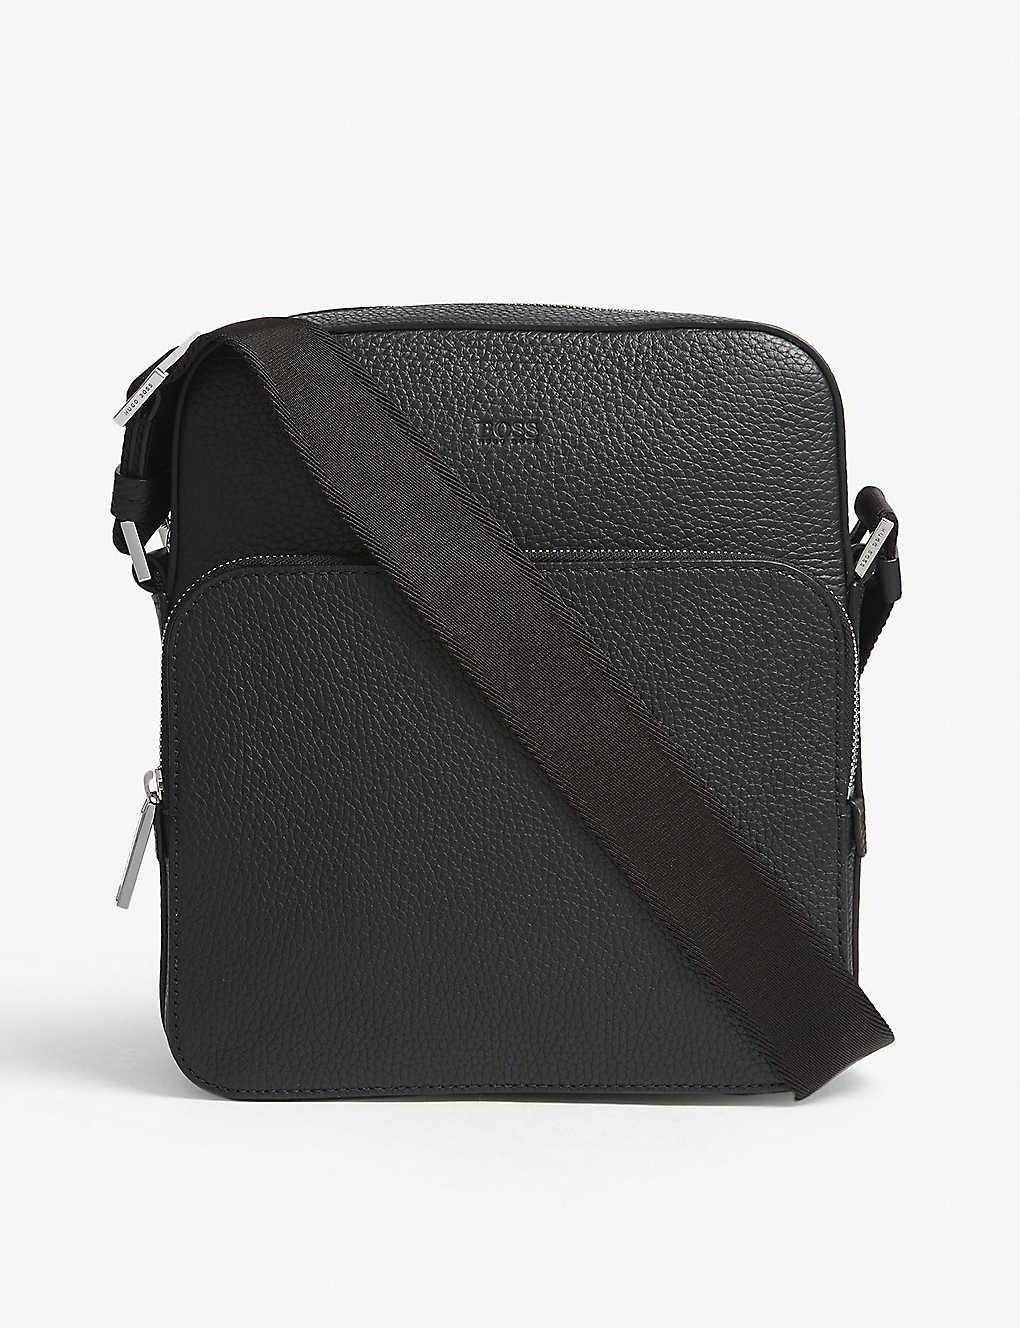 3402886d4838 BOSS - Crosstown grained leather reporter messenger bag | Selfridges ...